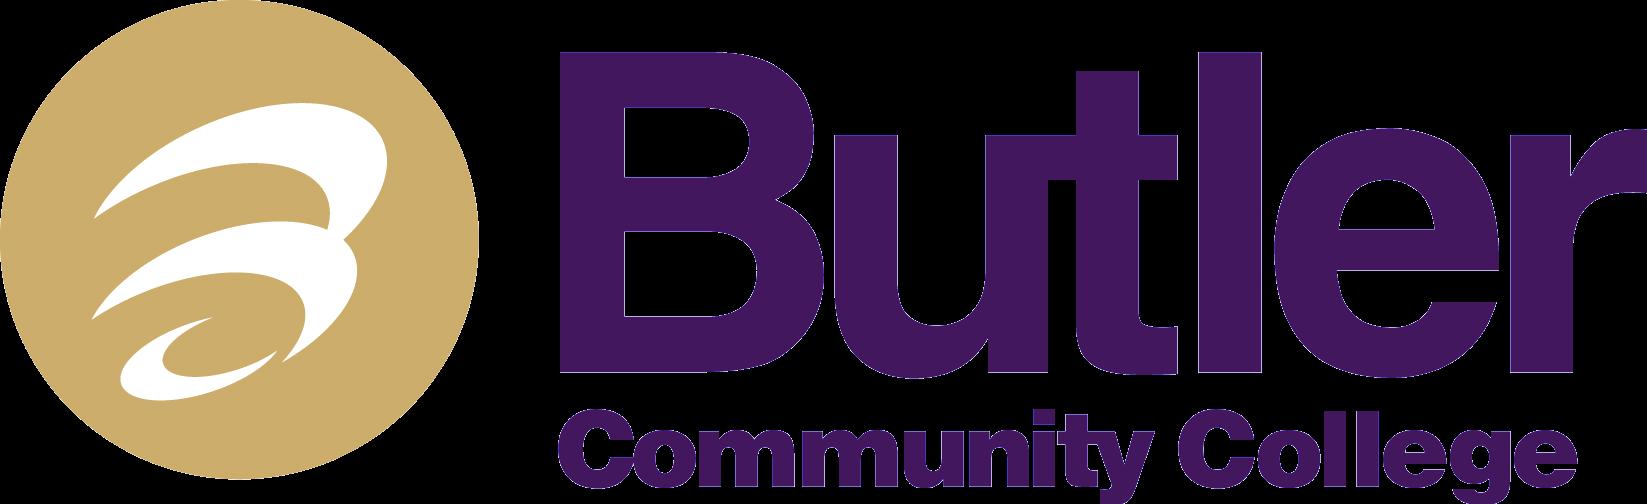 Butler Community College 104